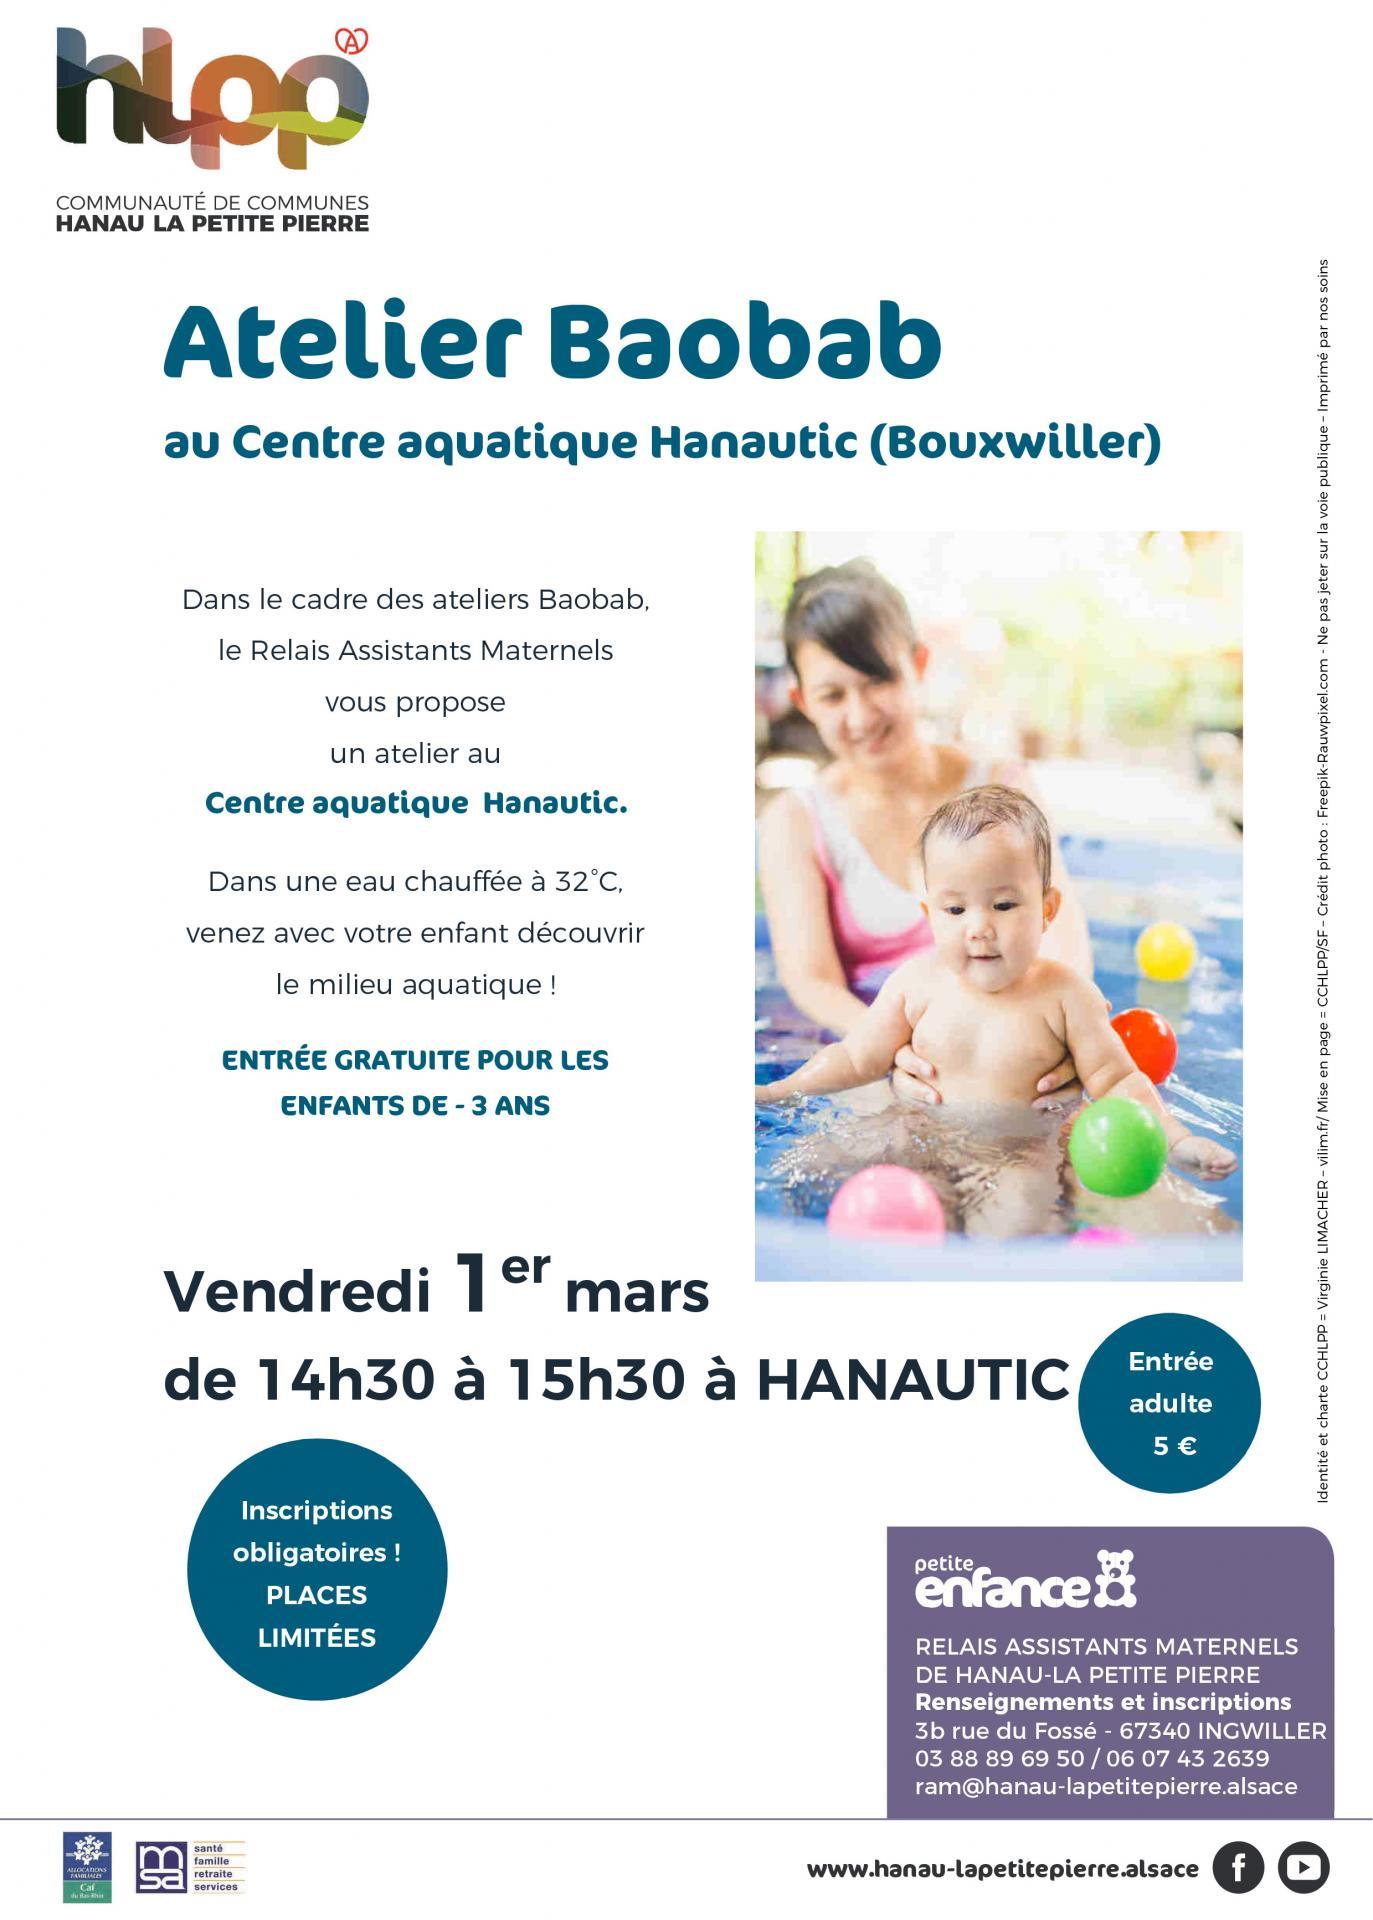 20190221 service petite enfance ram atelier baobab hanautic